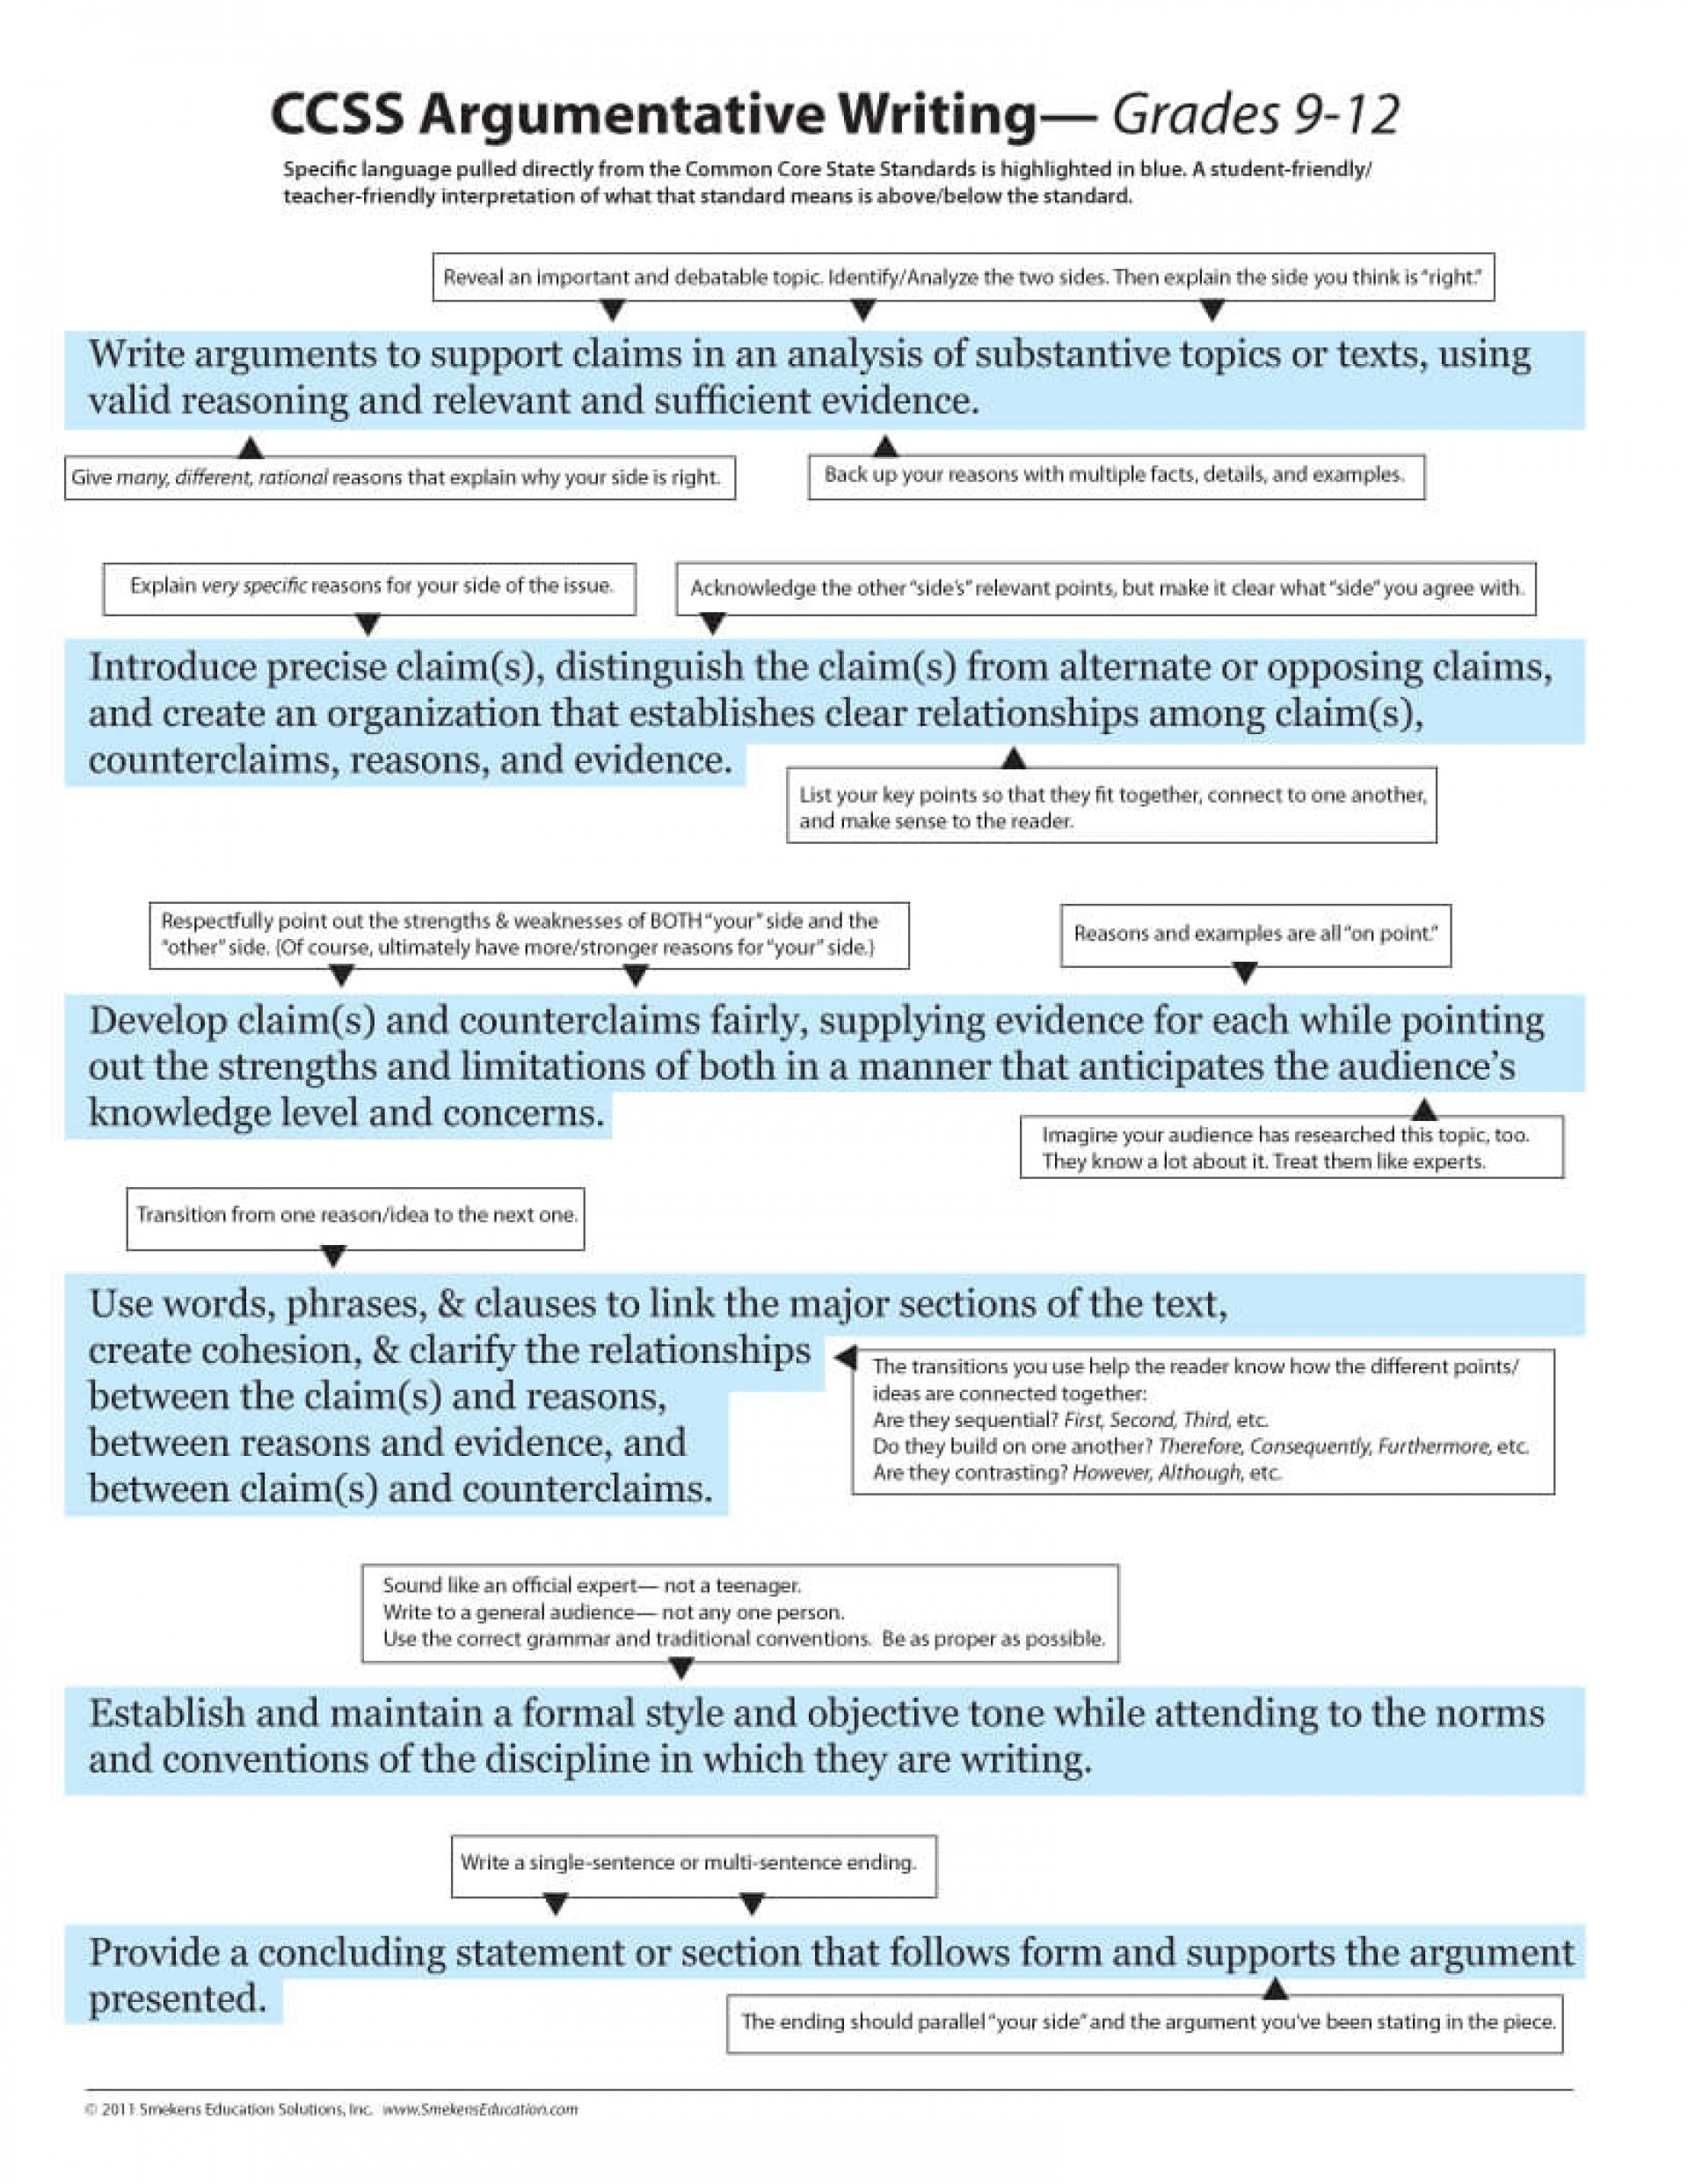 007 Ccss Argumentative Grade 9 12o Persuasive Vs Essay Awful Are And Essays The Same Differentiate 1920